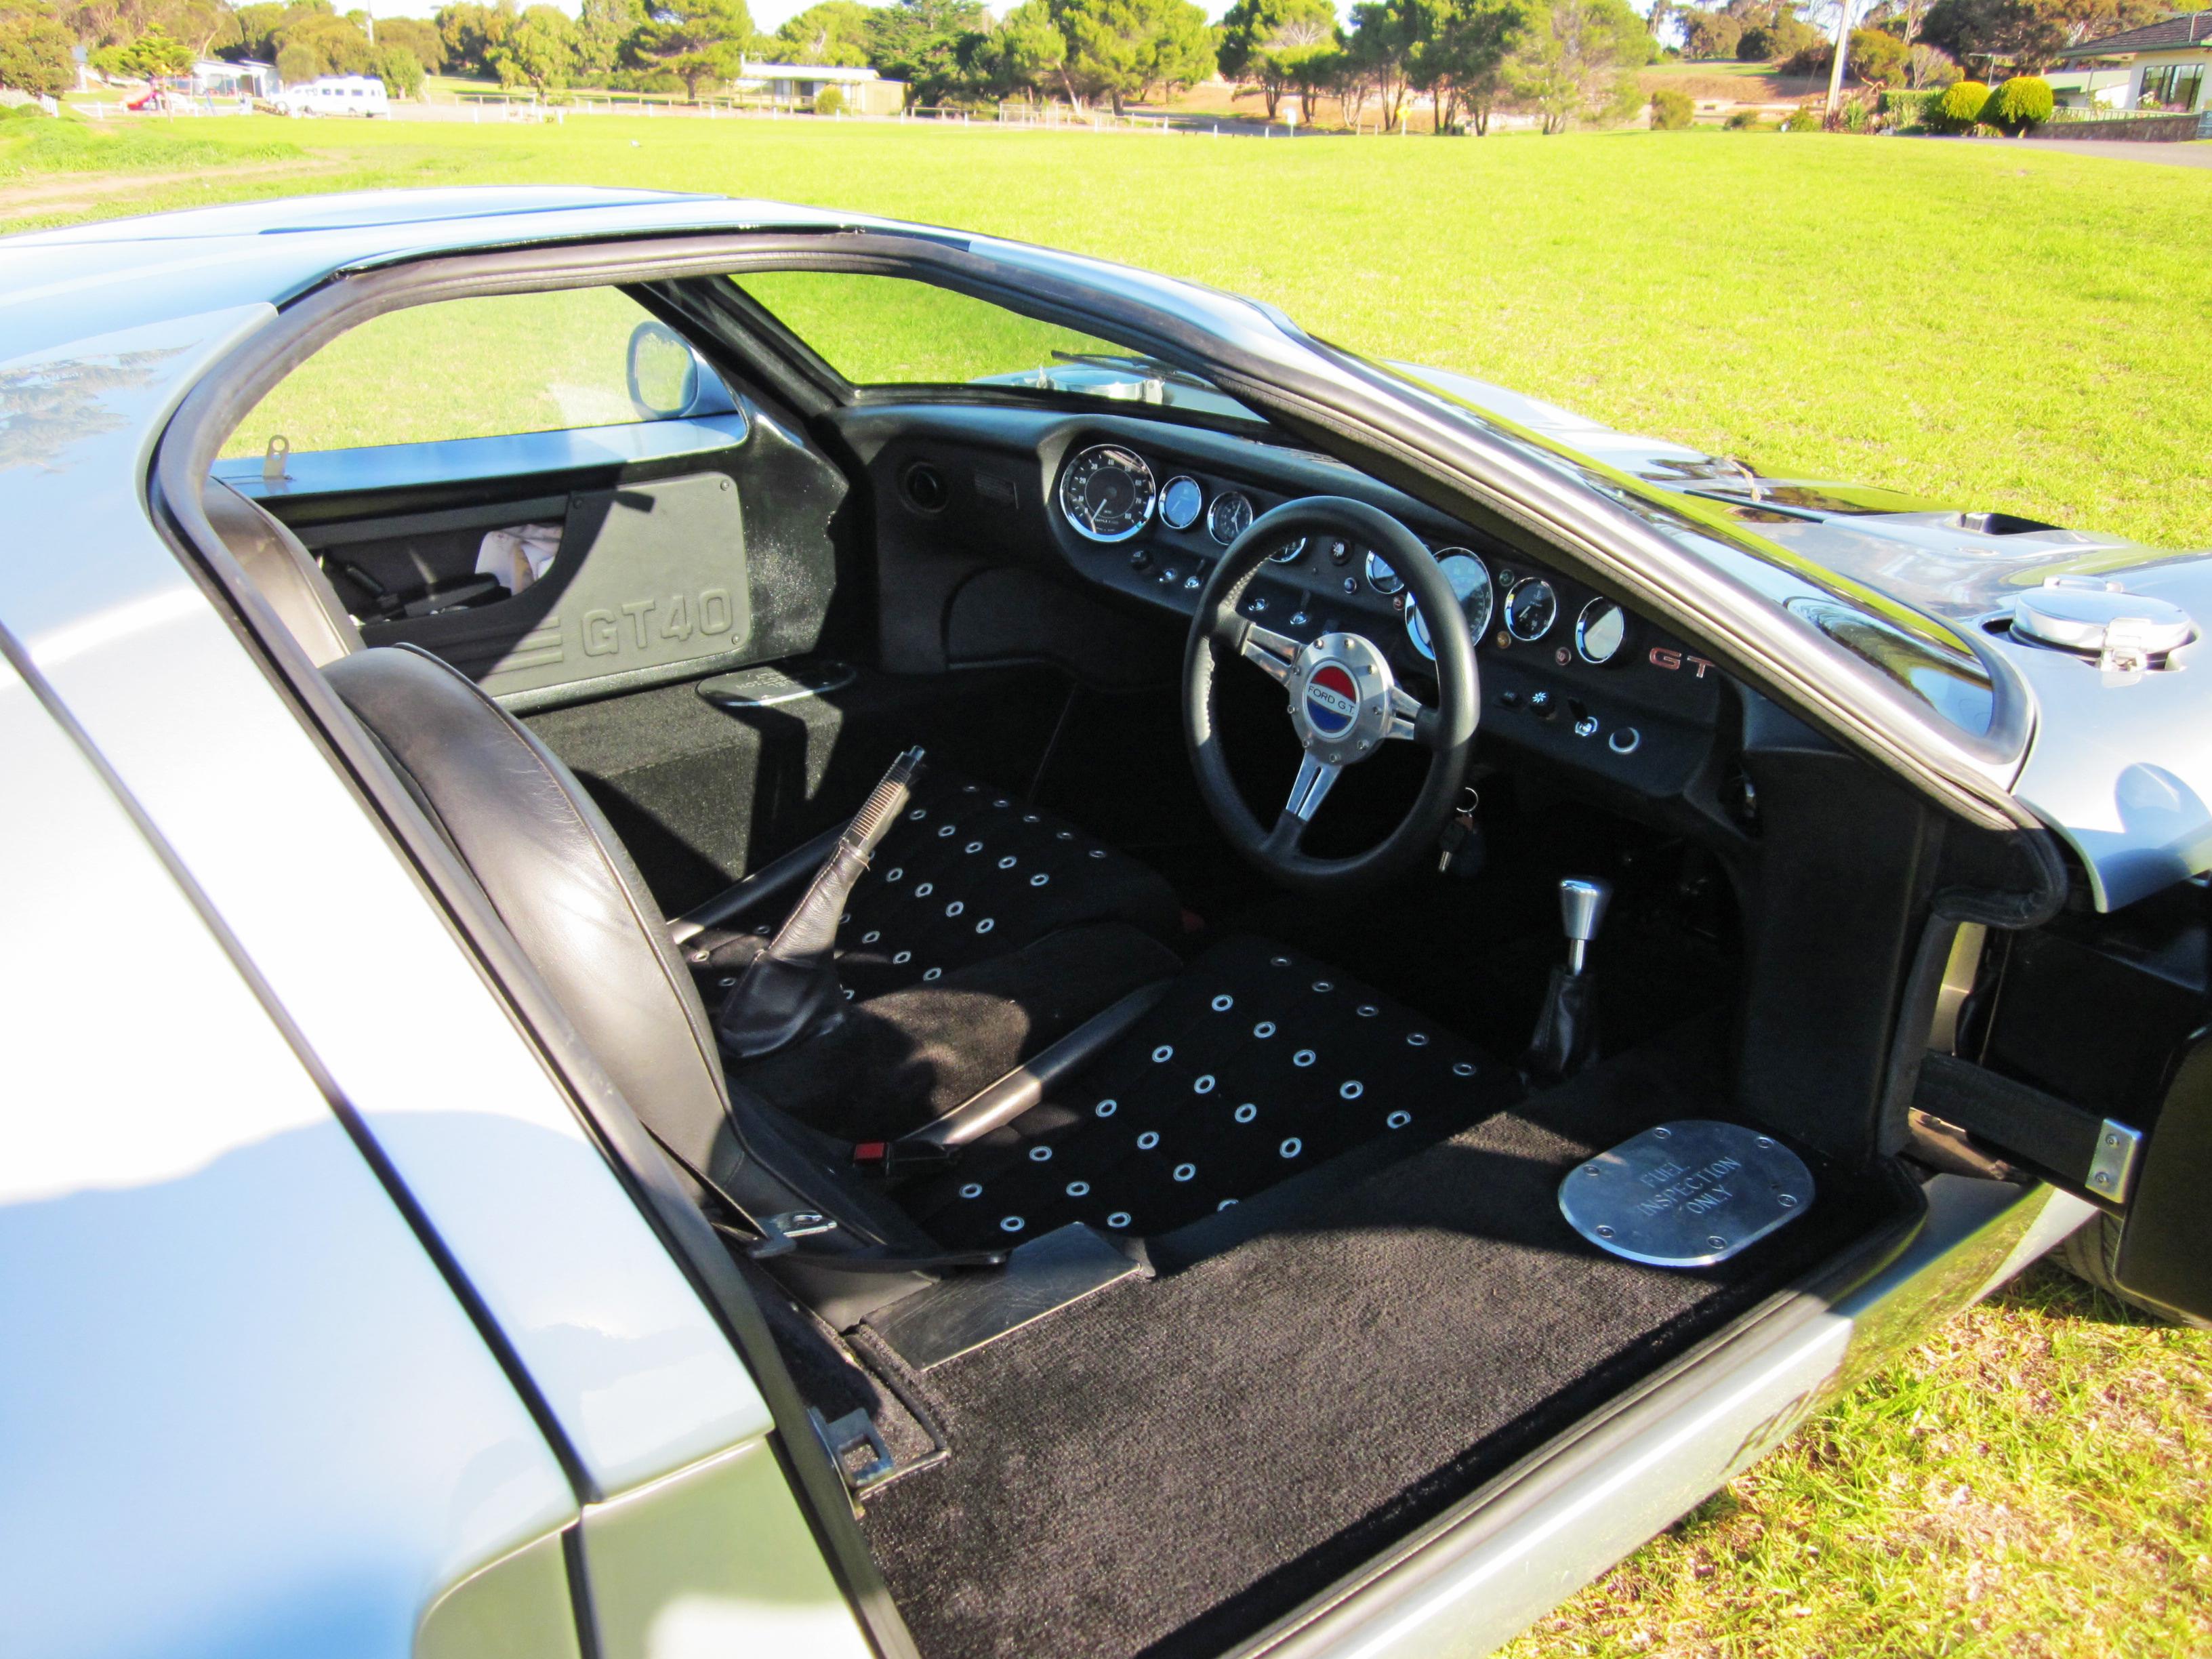 GT40-1 063